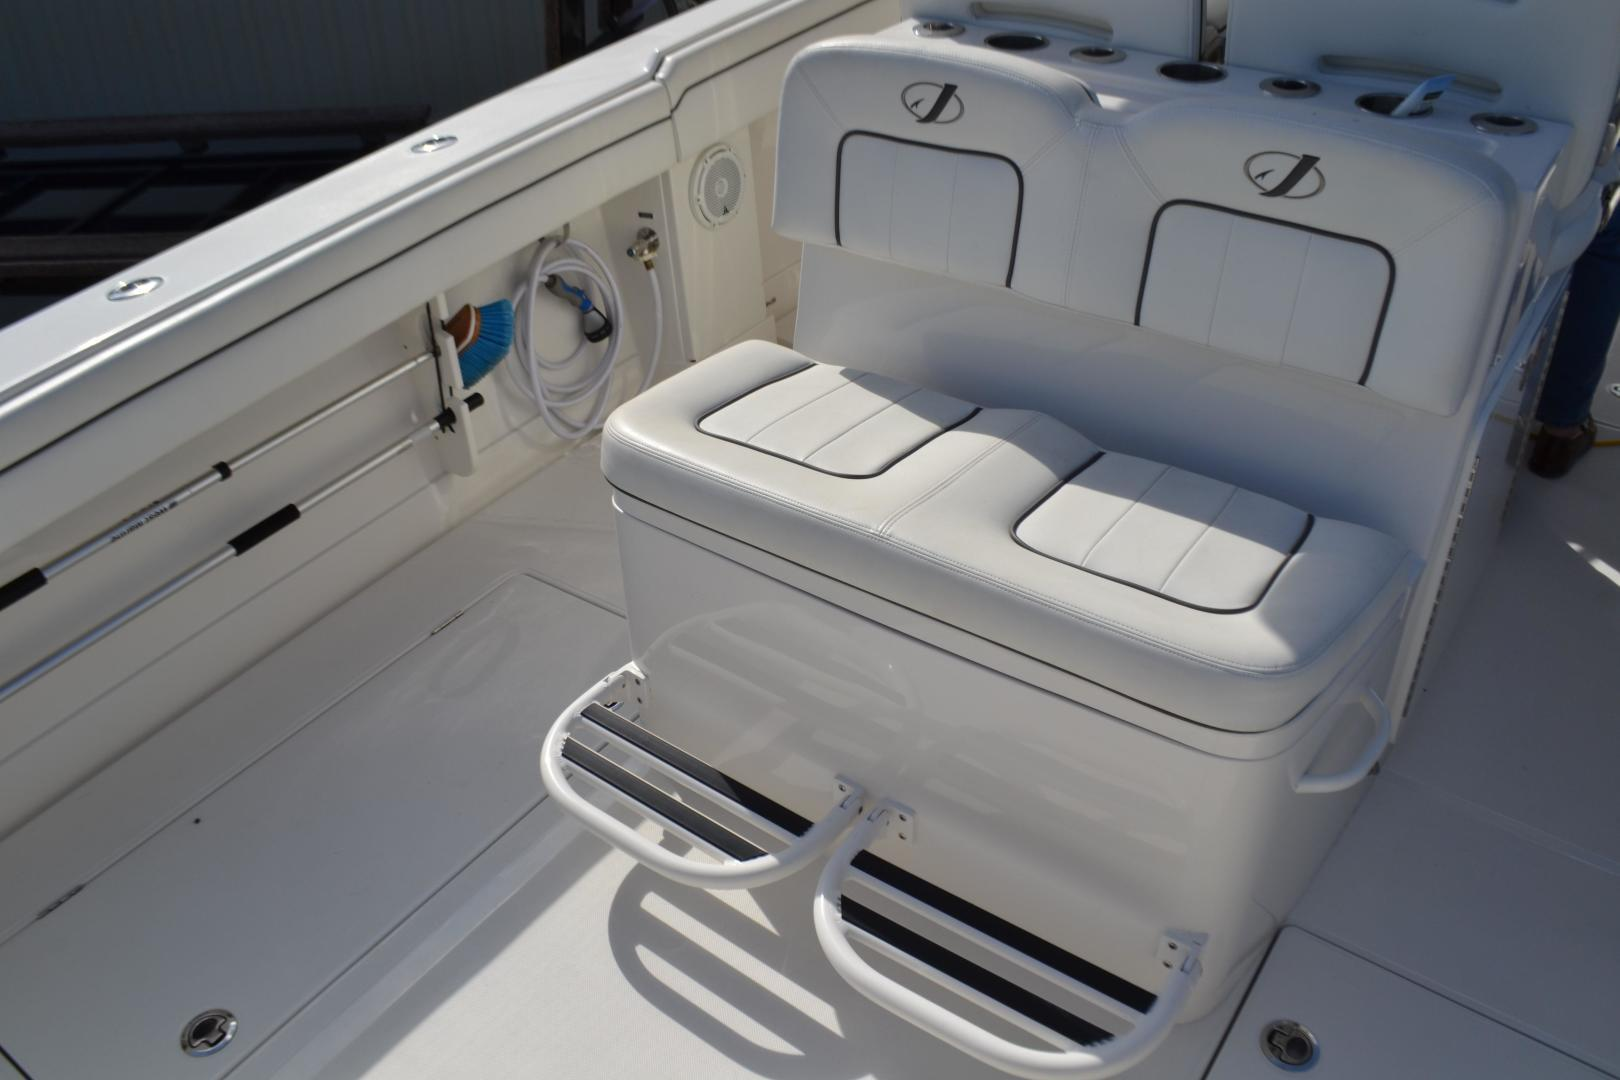 Mezzanine Seat, Refrigerated